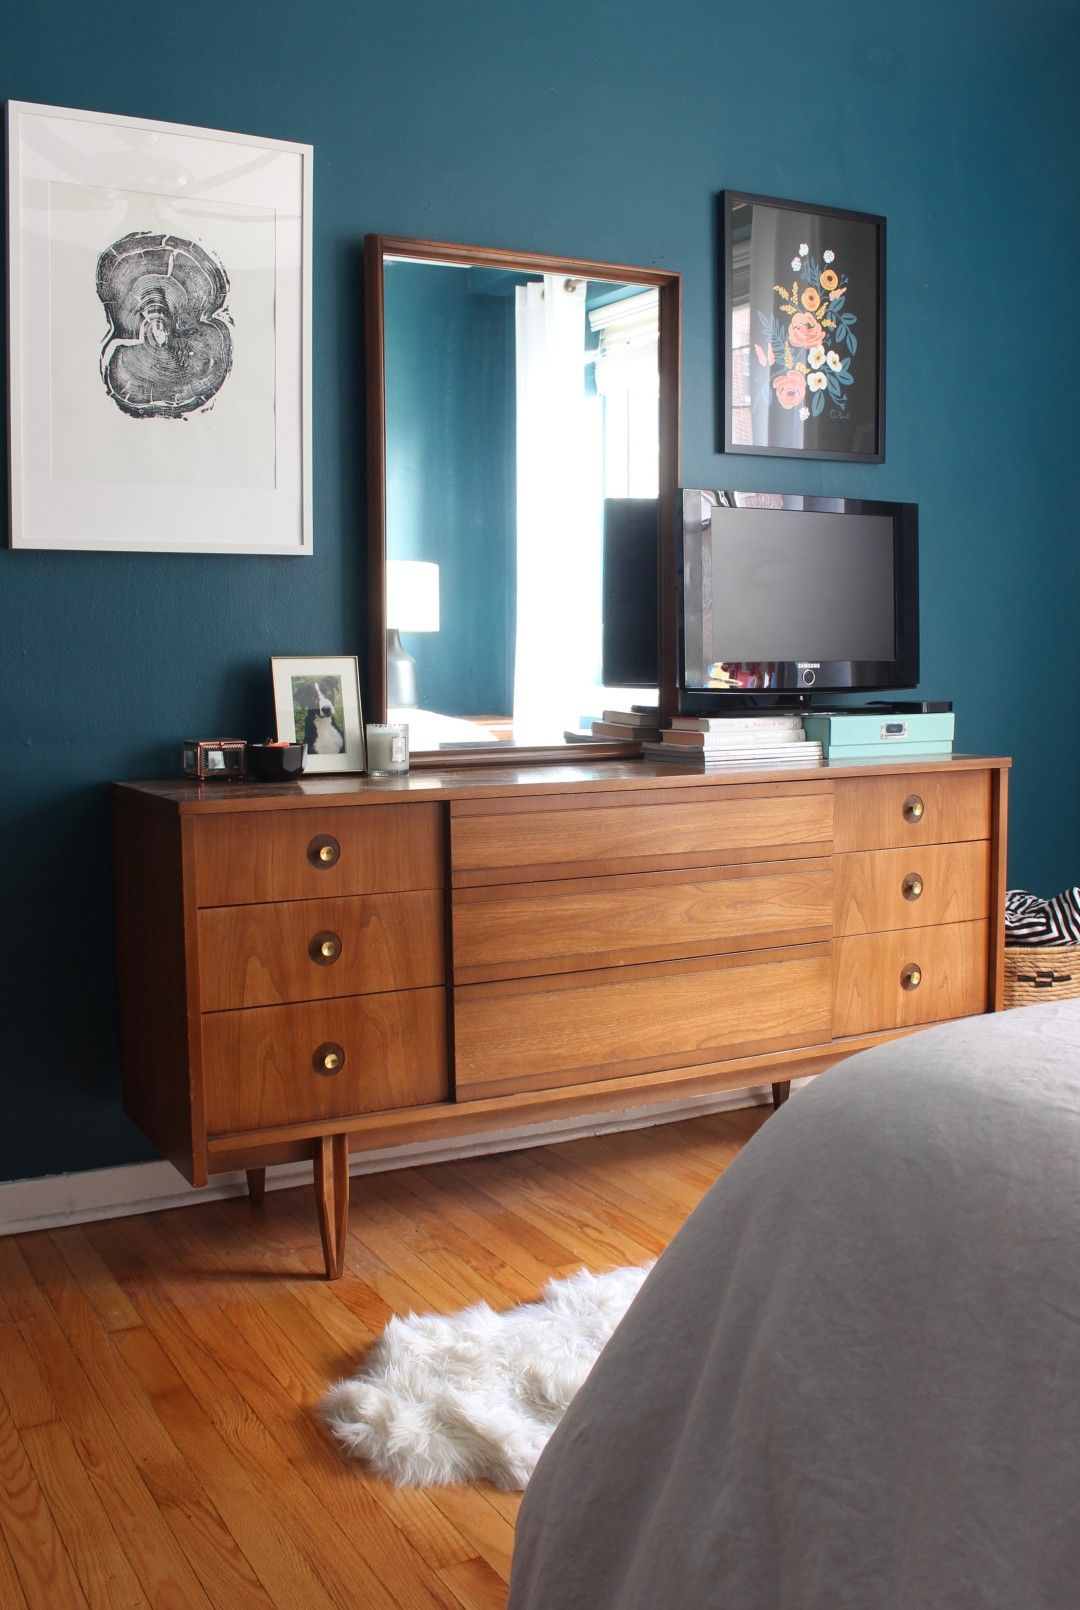 Best Mid Century Moody Bedroom The Reveal Teal Walls 400 x 300